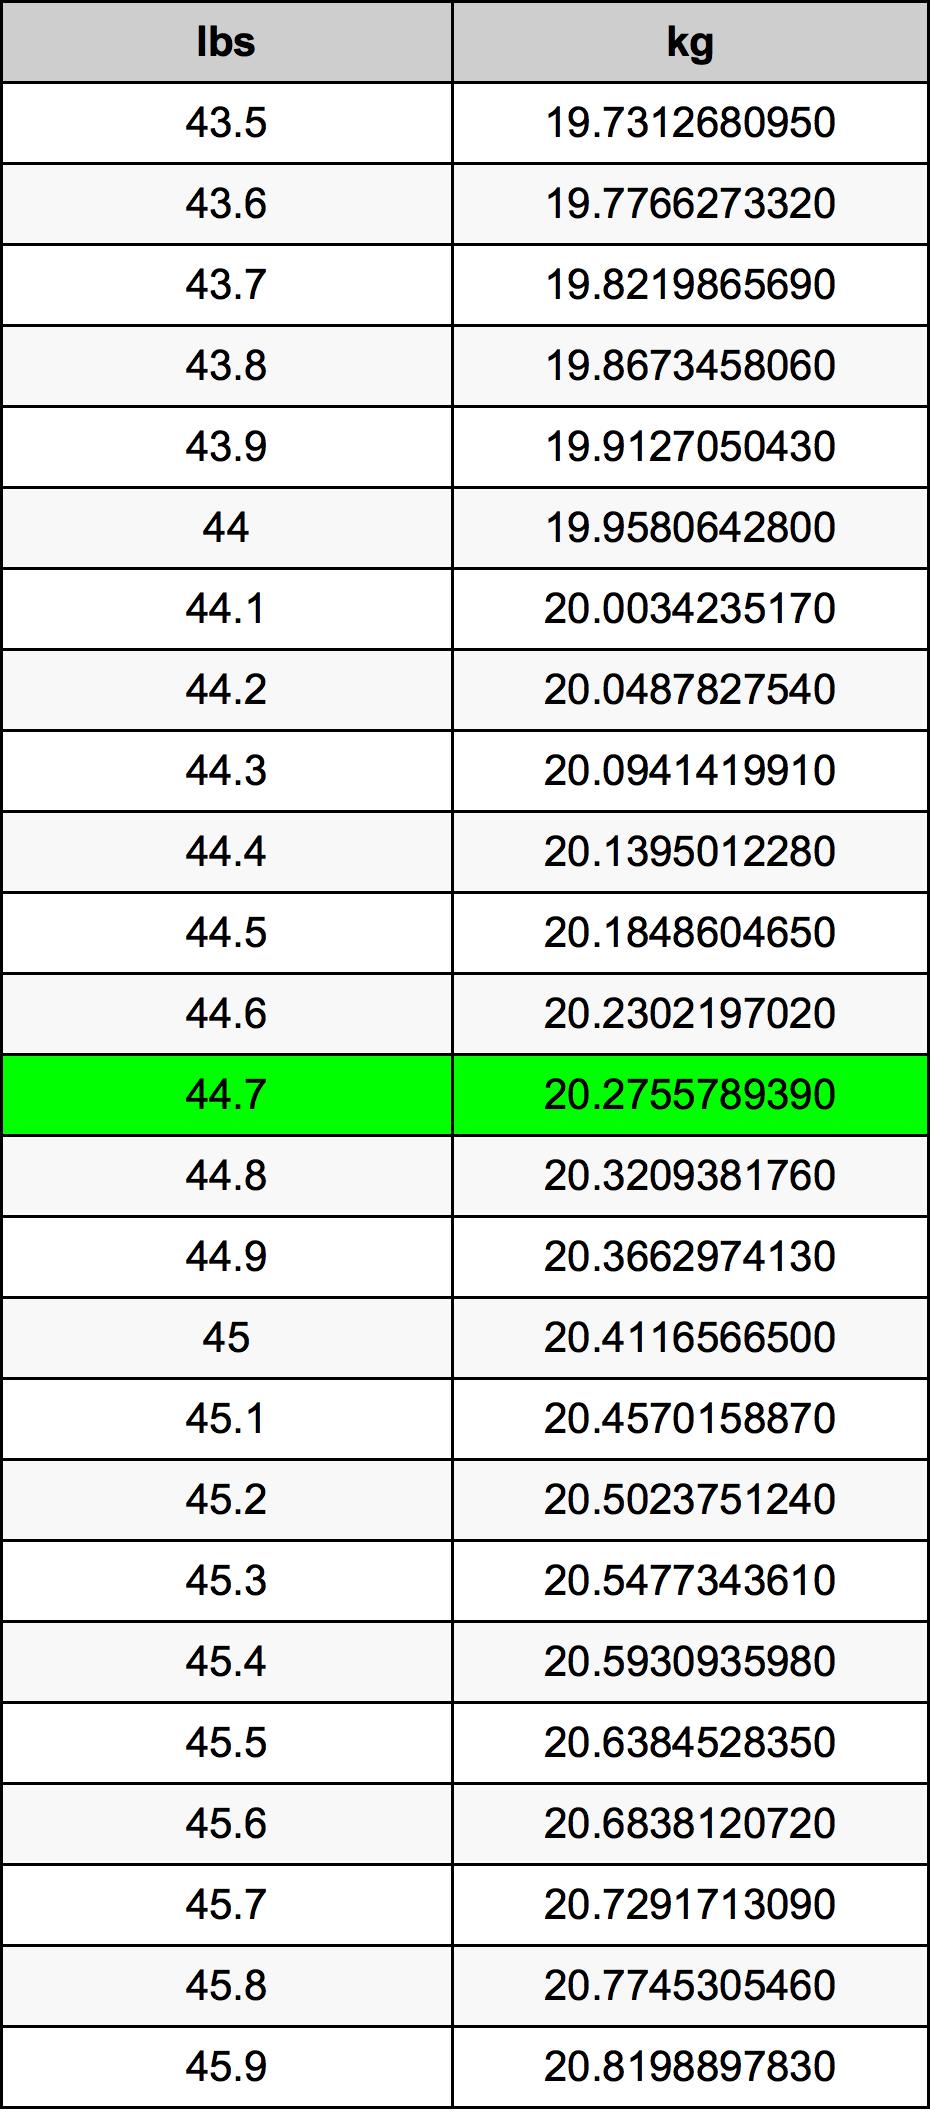 44.7 Pund konverteringstabell